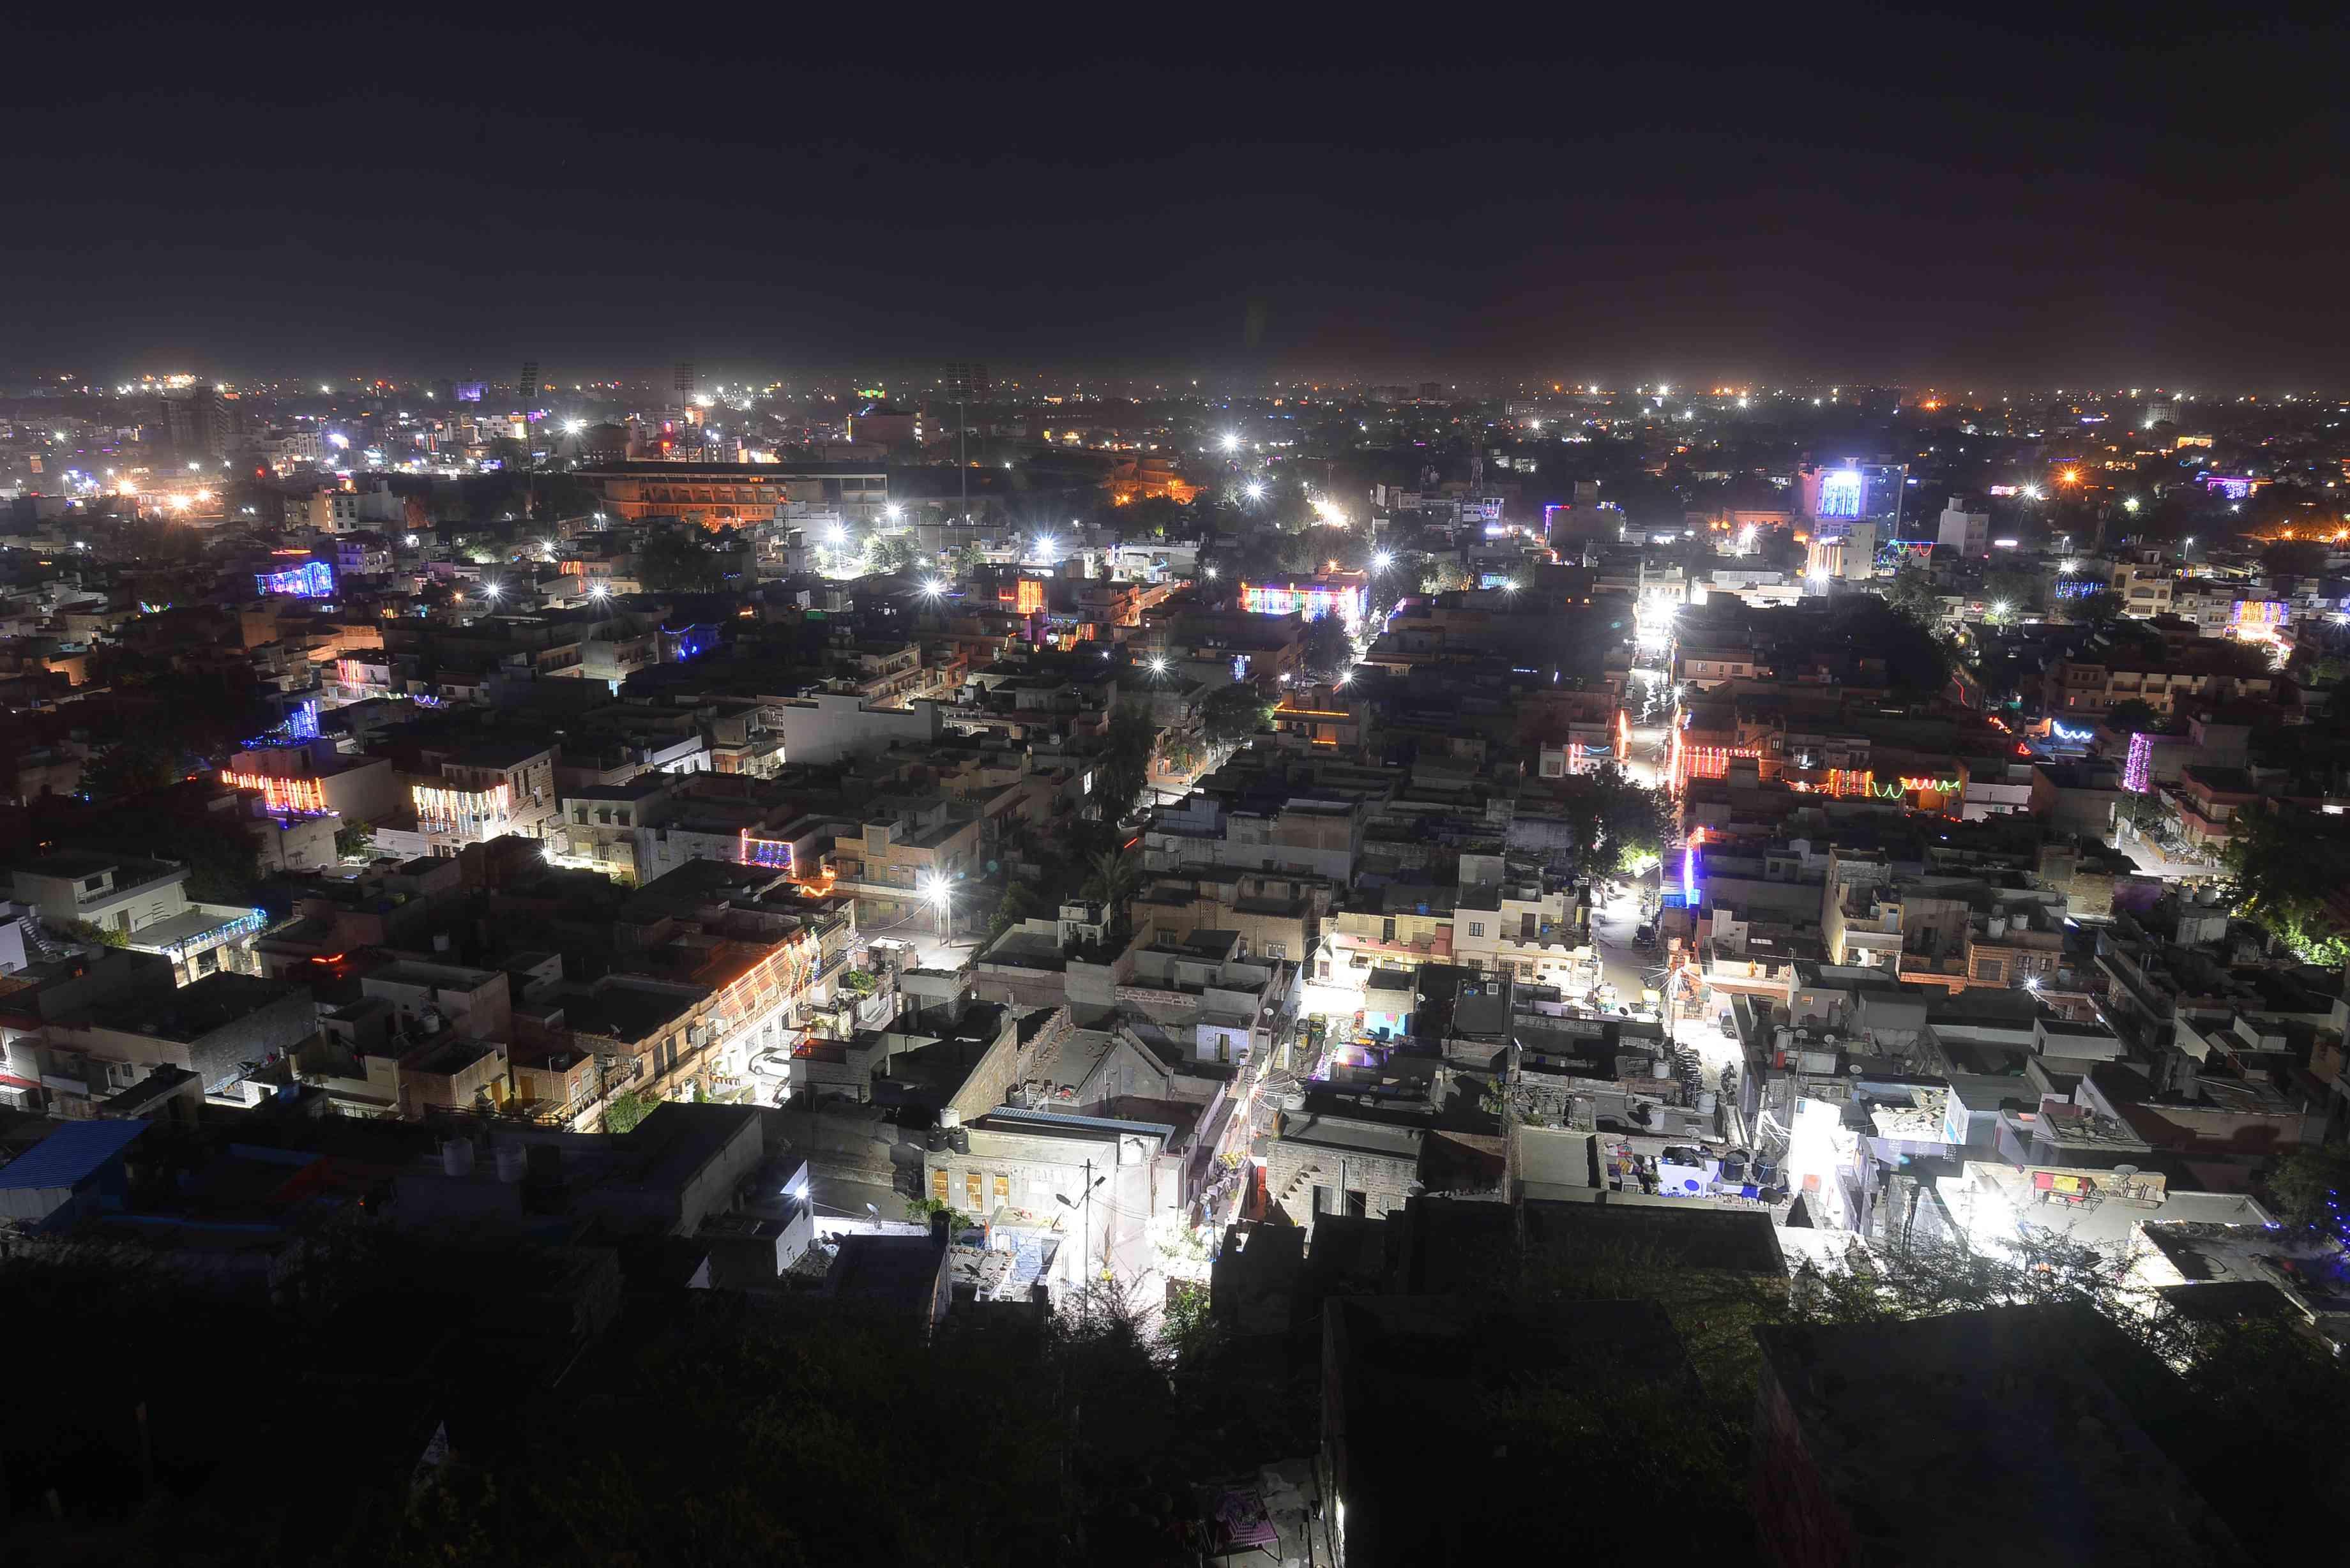 lighting on dhanteras in Jodhpur